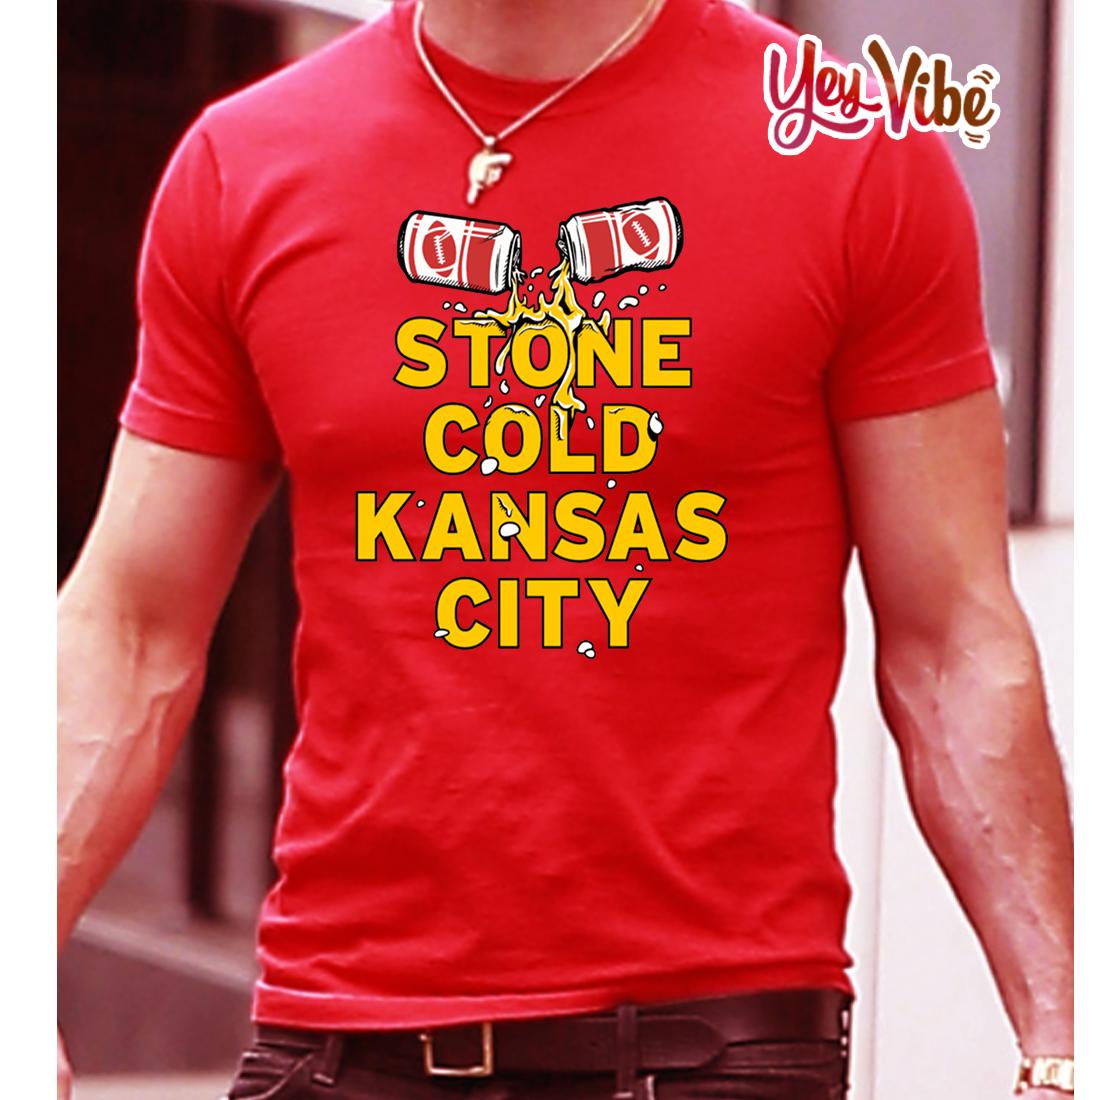 STONE COLD KANSAS CITY T-SHIRT